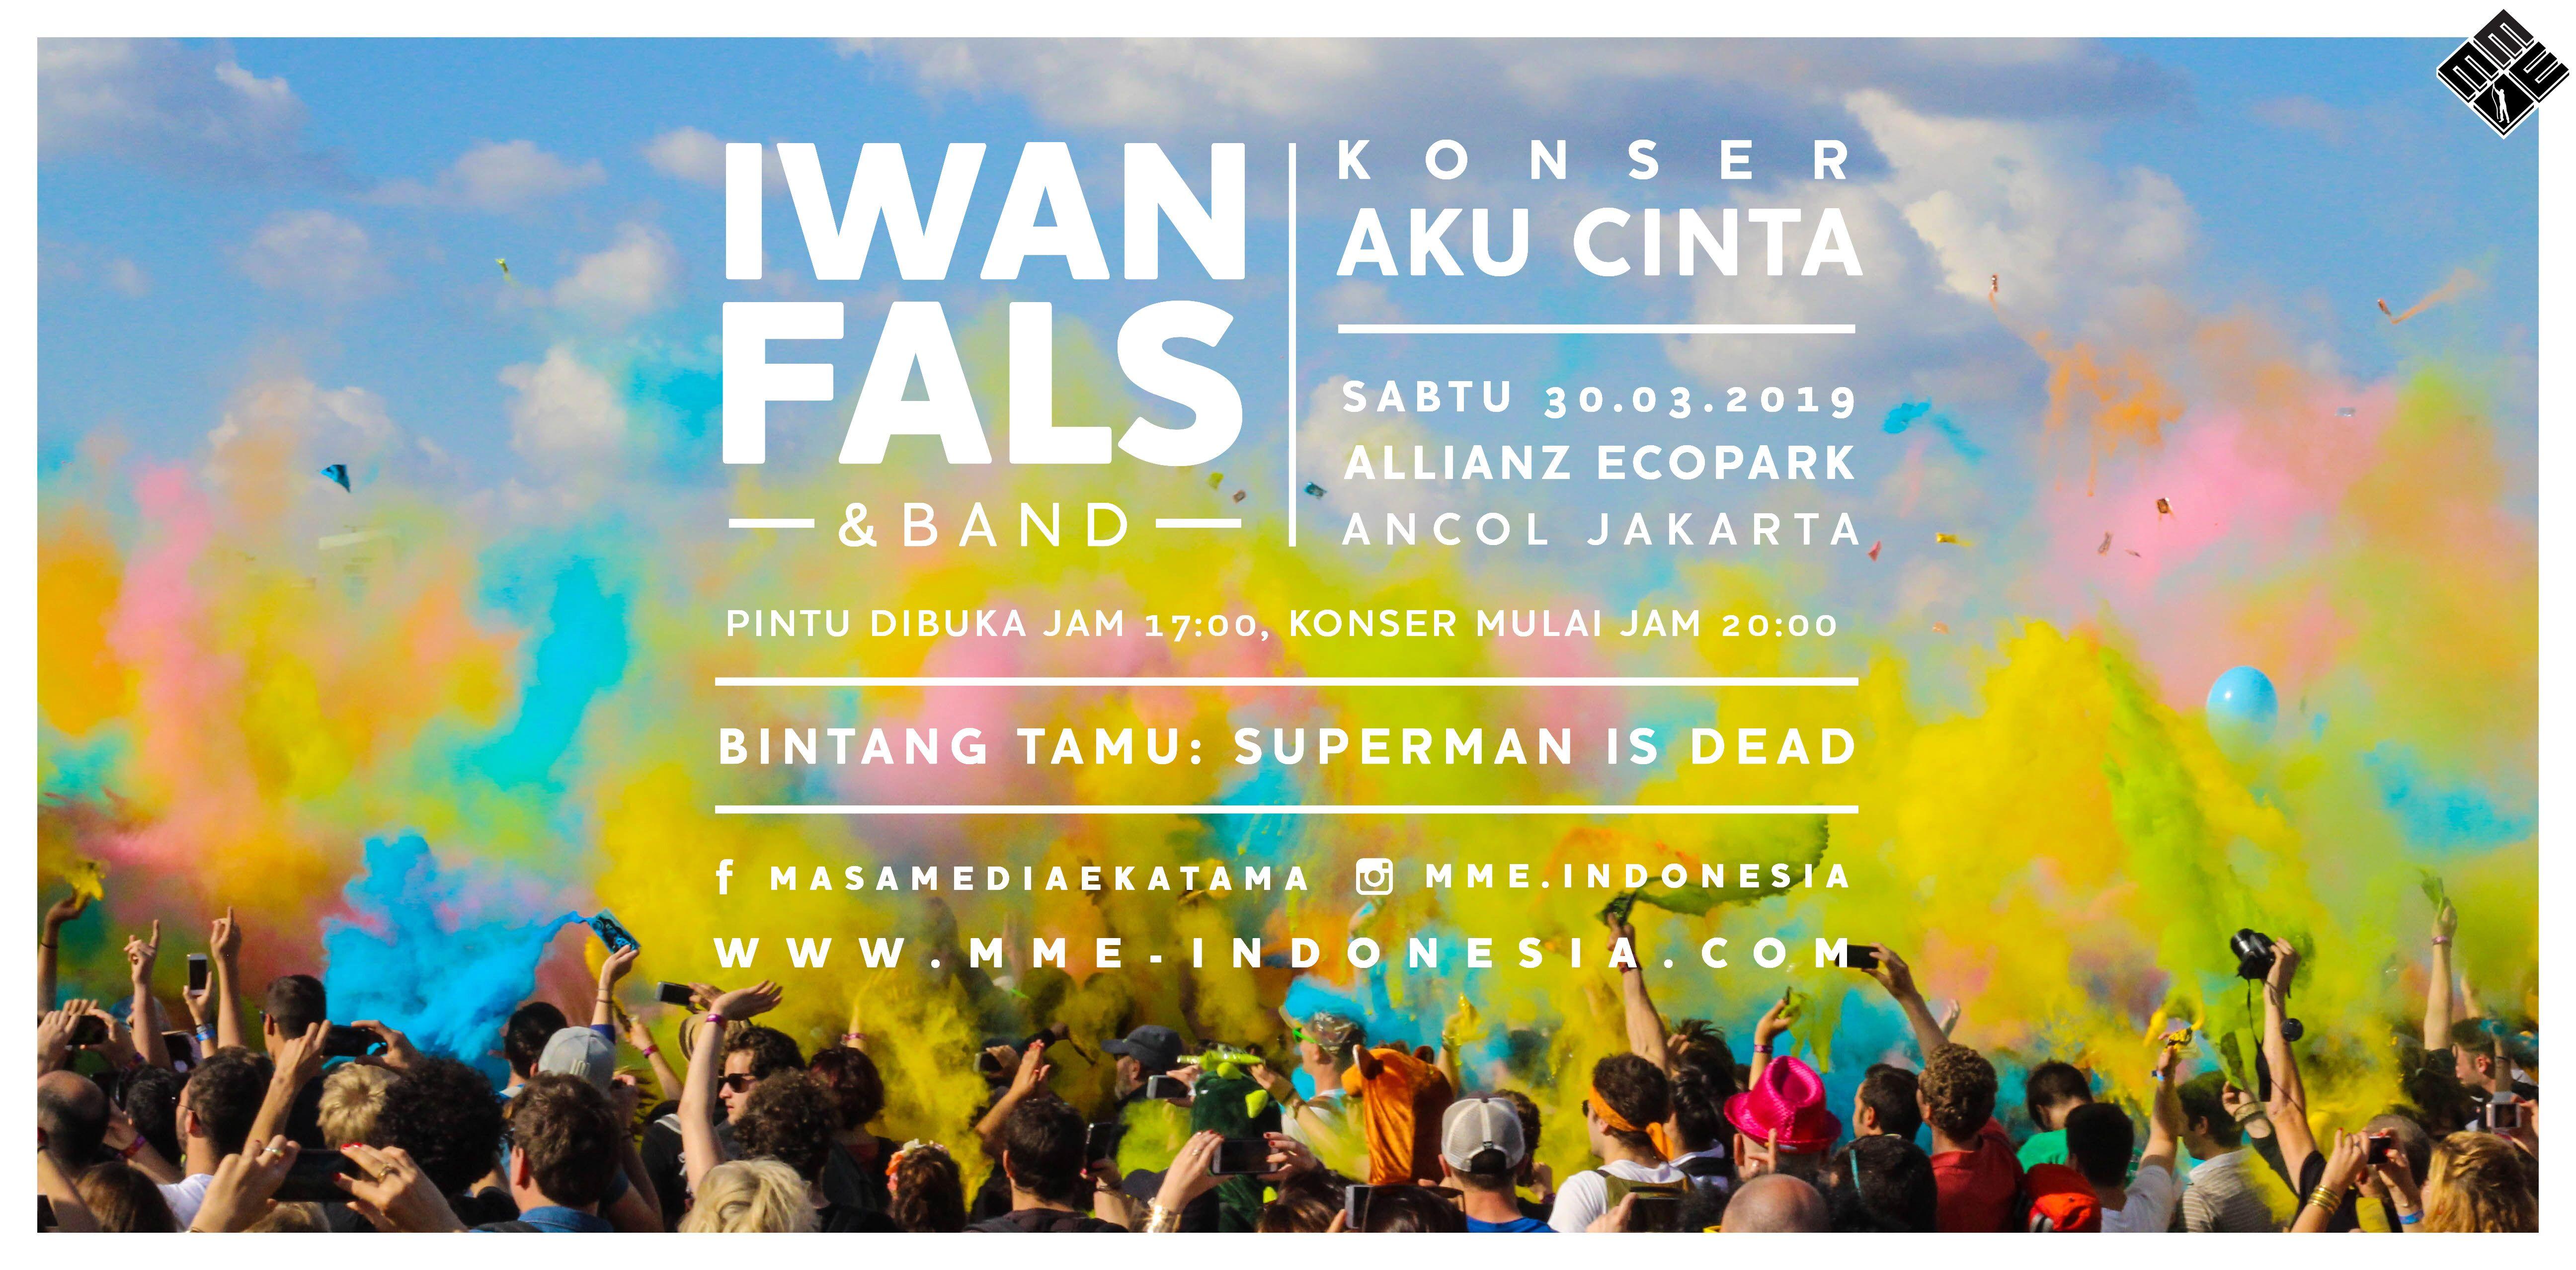 Konser Iwan Fals digelar akhir Maret, bawa pesan Bhinneka Tunggal Ika